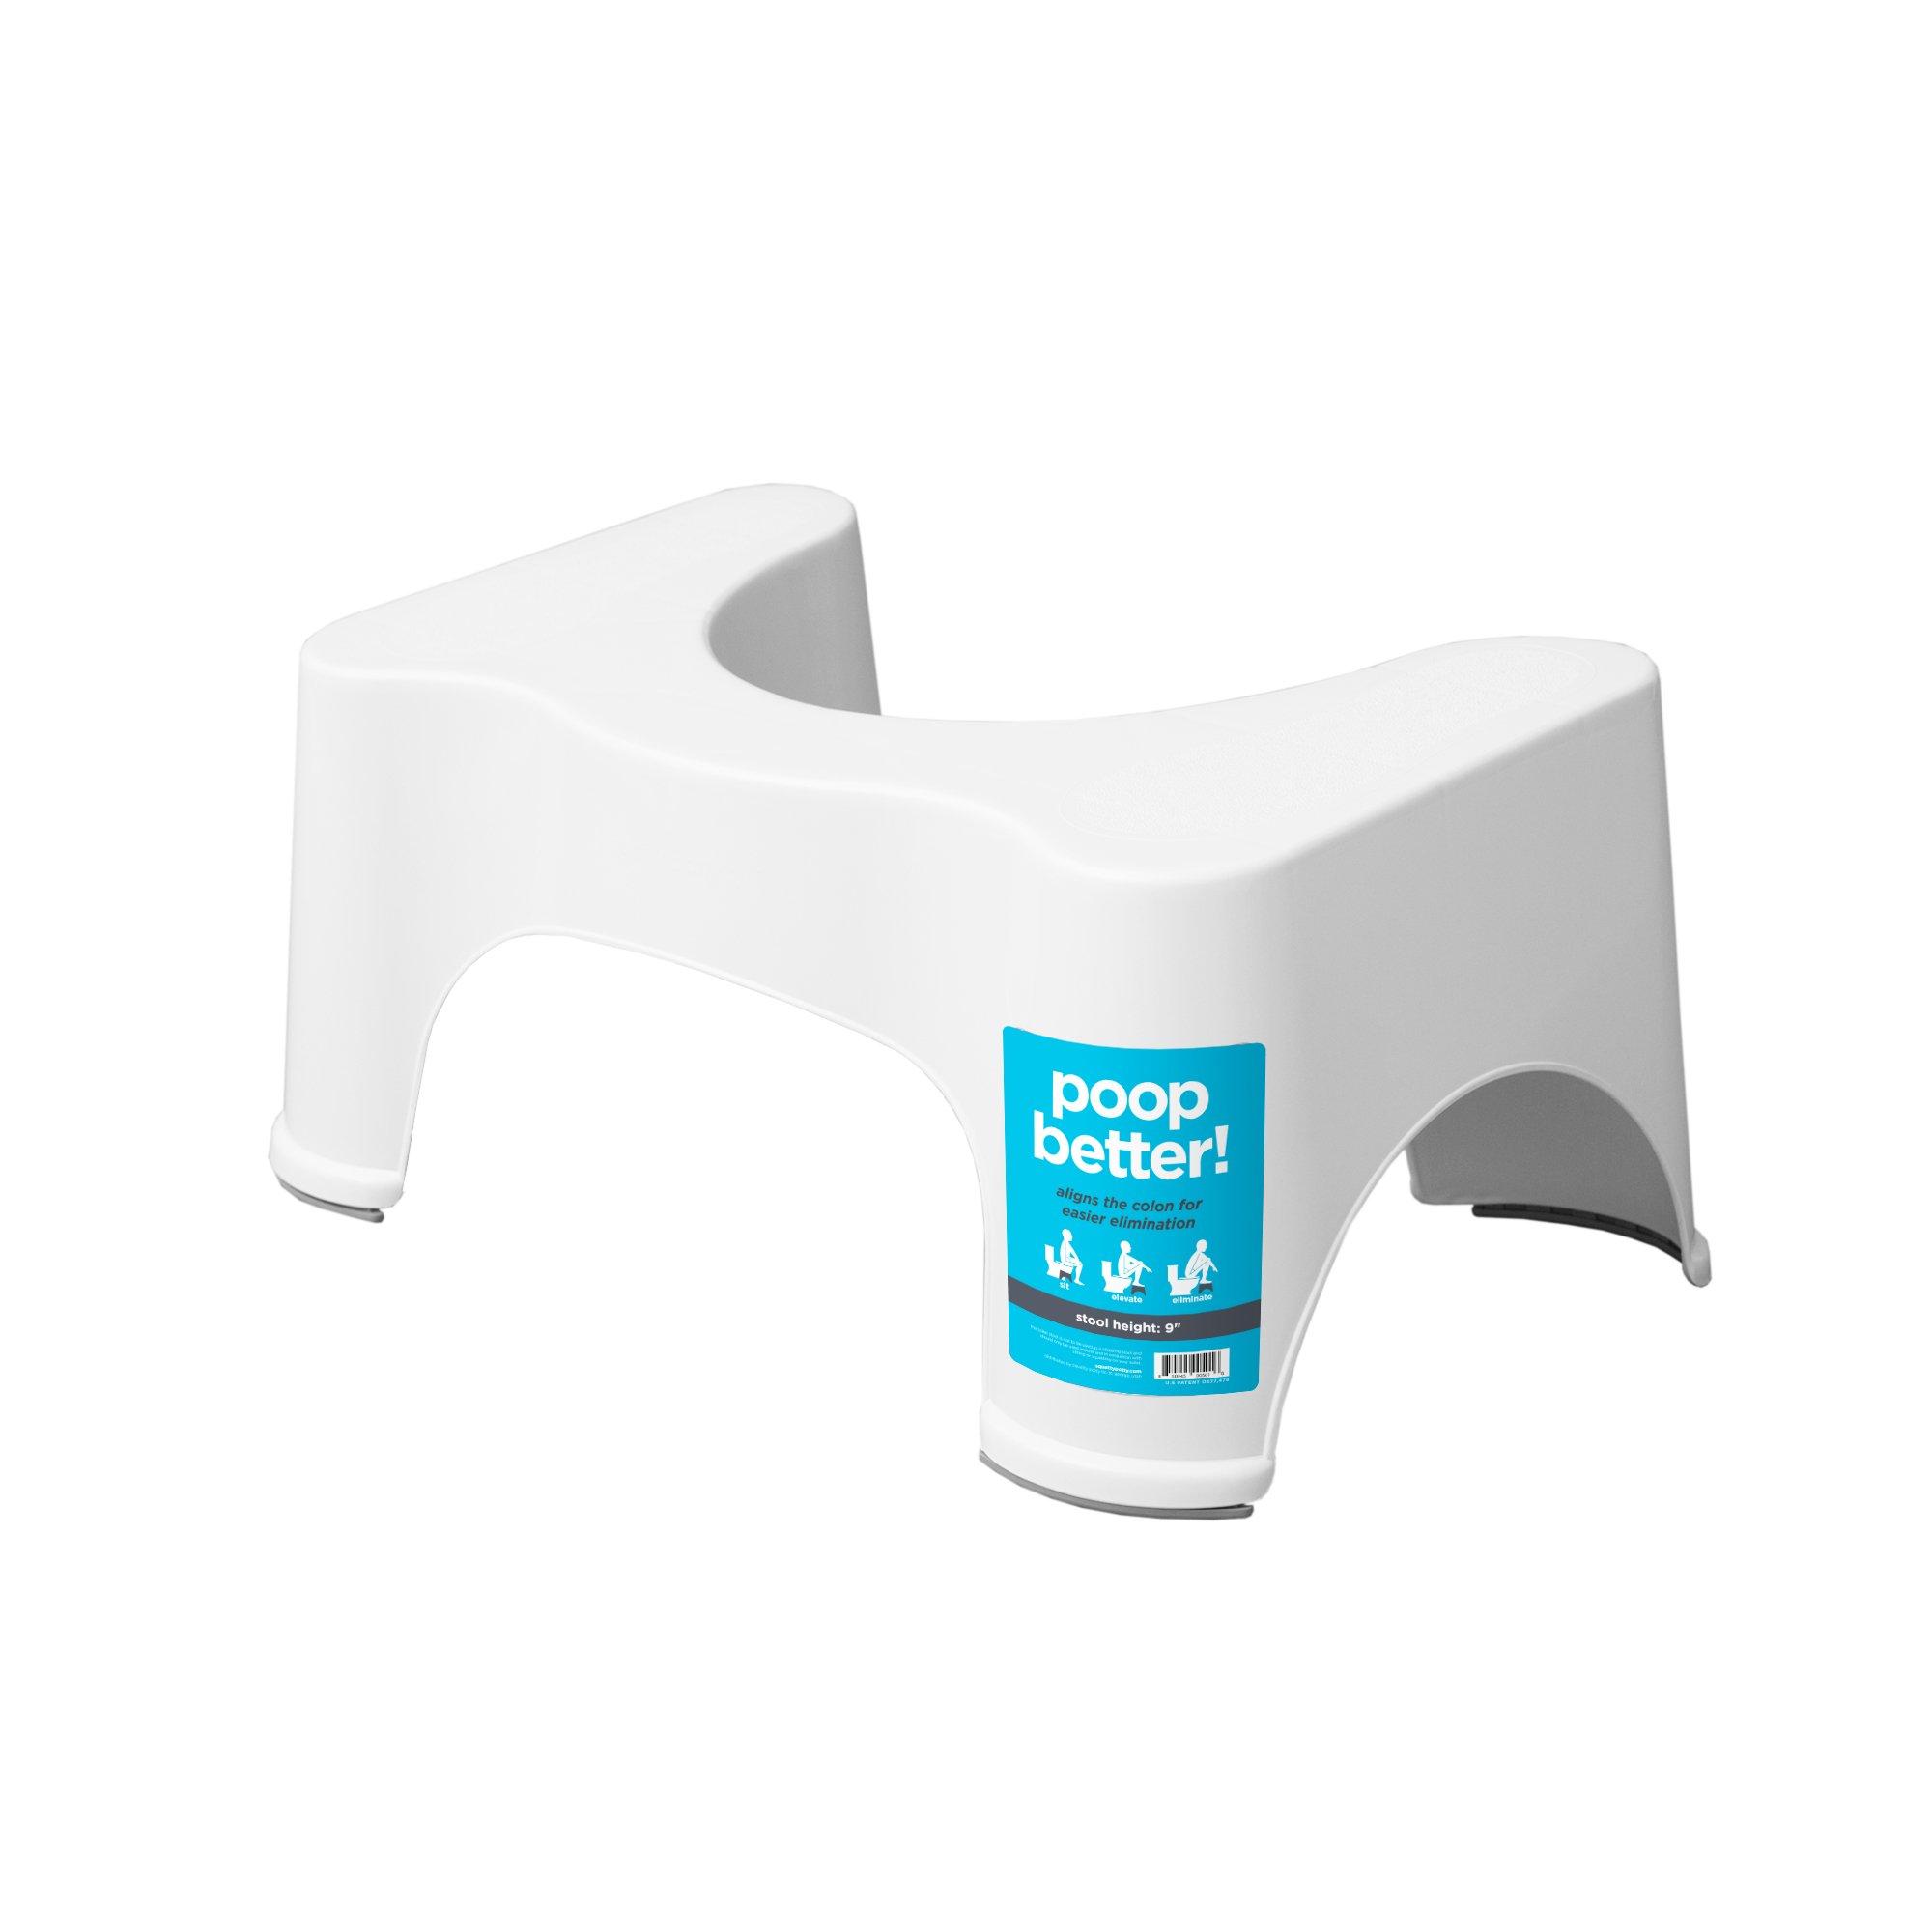 Squatty Potty The Original Bathroom Toilet Stool, 9 inch Height, White by Squatty Potty